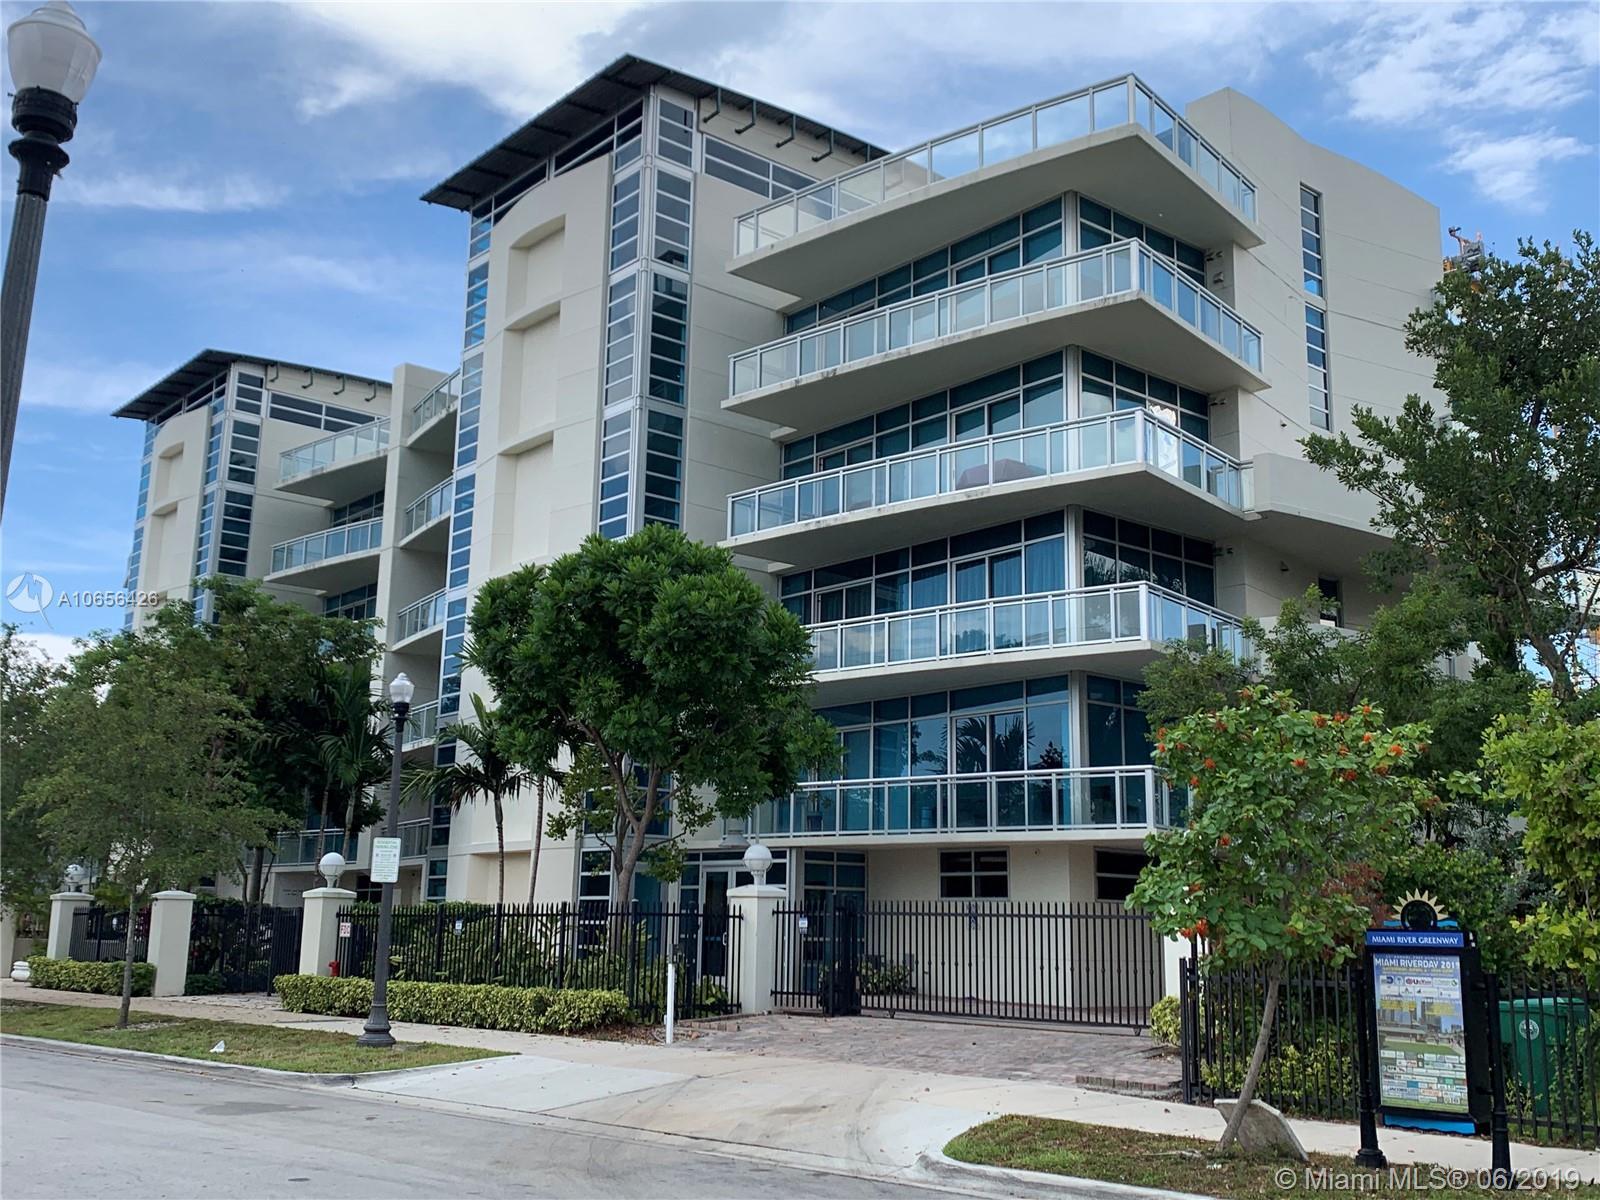 1090 NW N River Dr 304, Miami, FL 33136